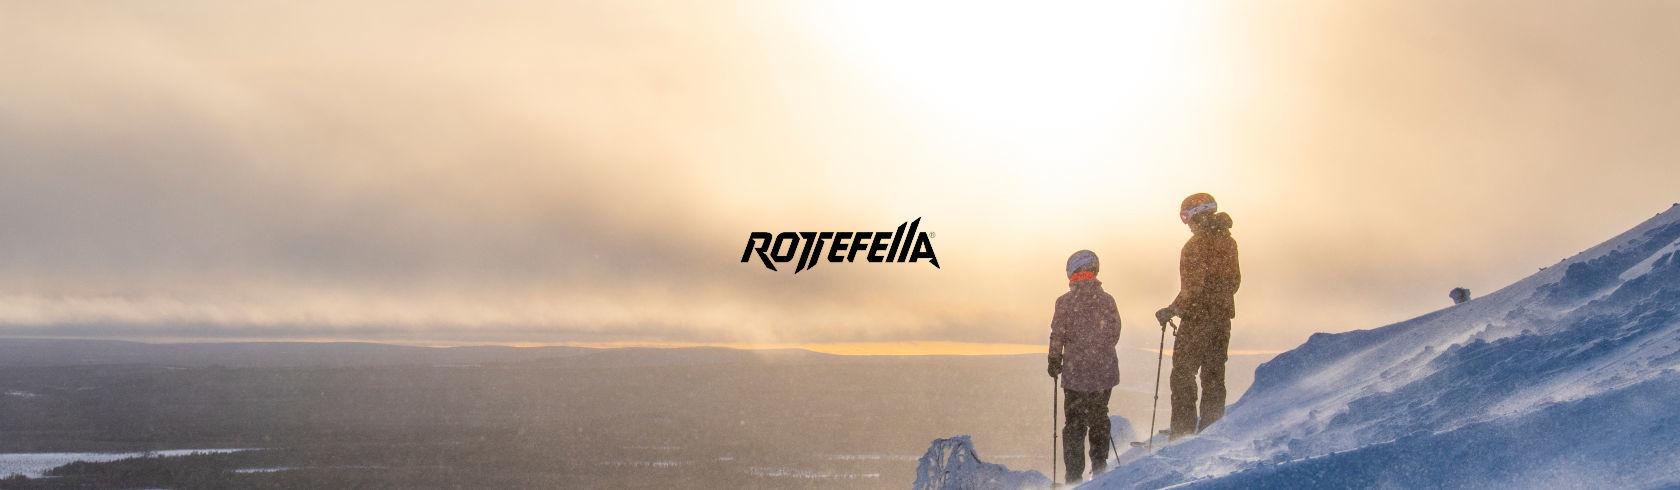 Rottefella brand logo